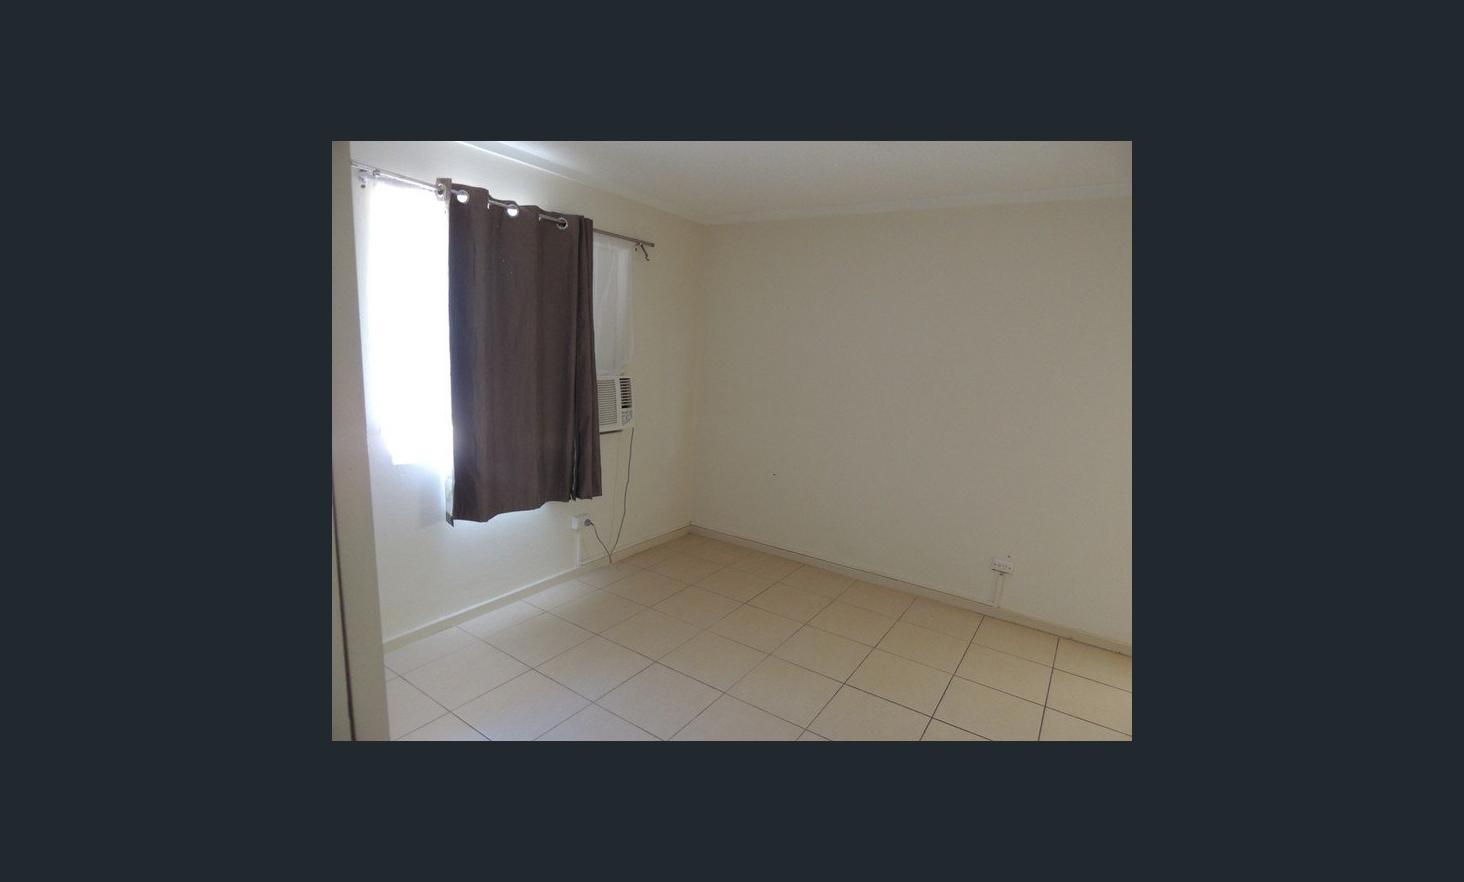 2/23 Leichardt St TENNANT CREEK NT 860 Andrews Property